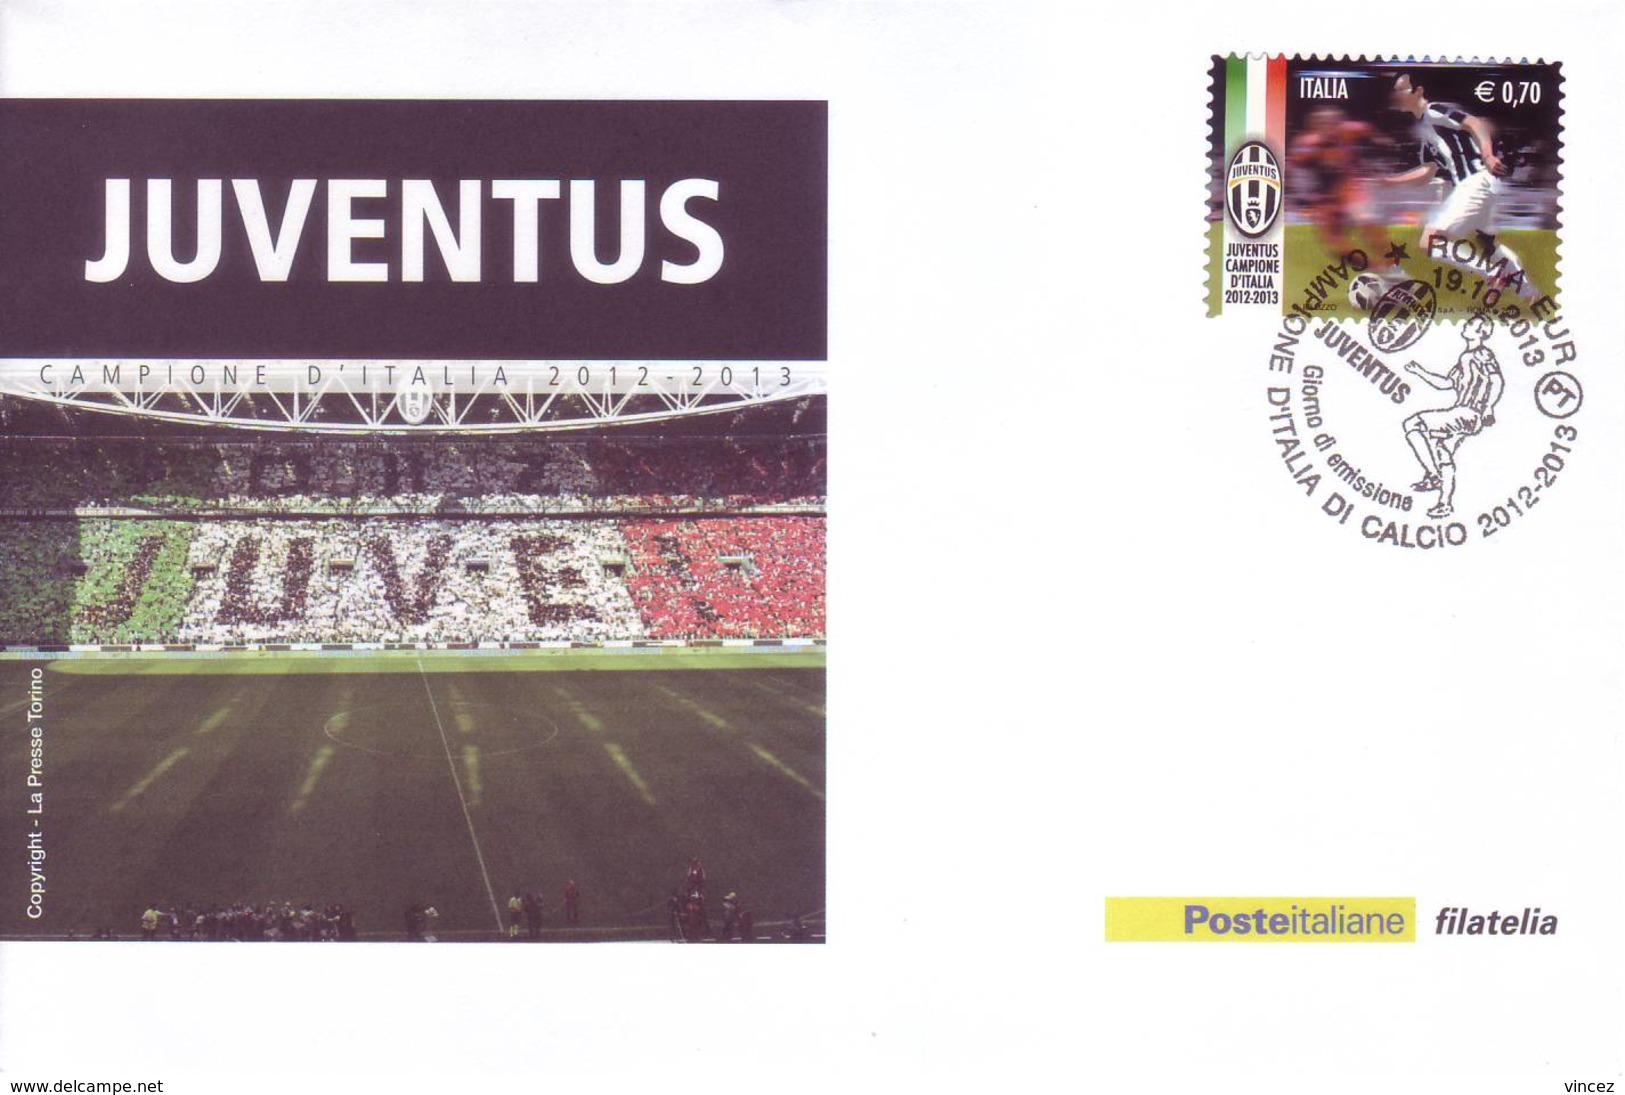 Italia 2013 - Juventus Campione, Su Cartoline Affrancata E Con Annullo Speciale - Beroemde Teams